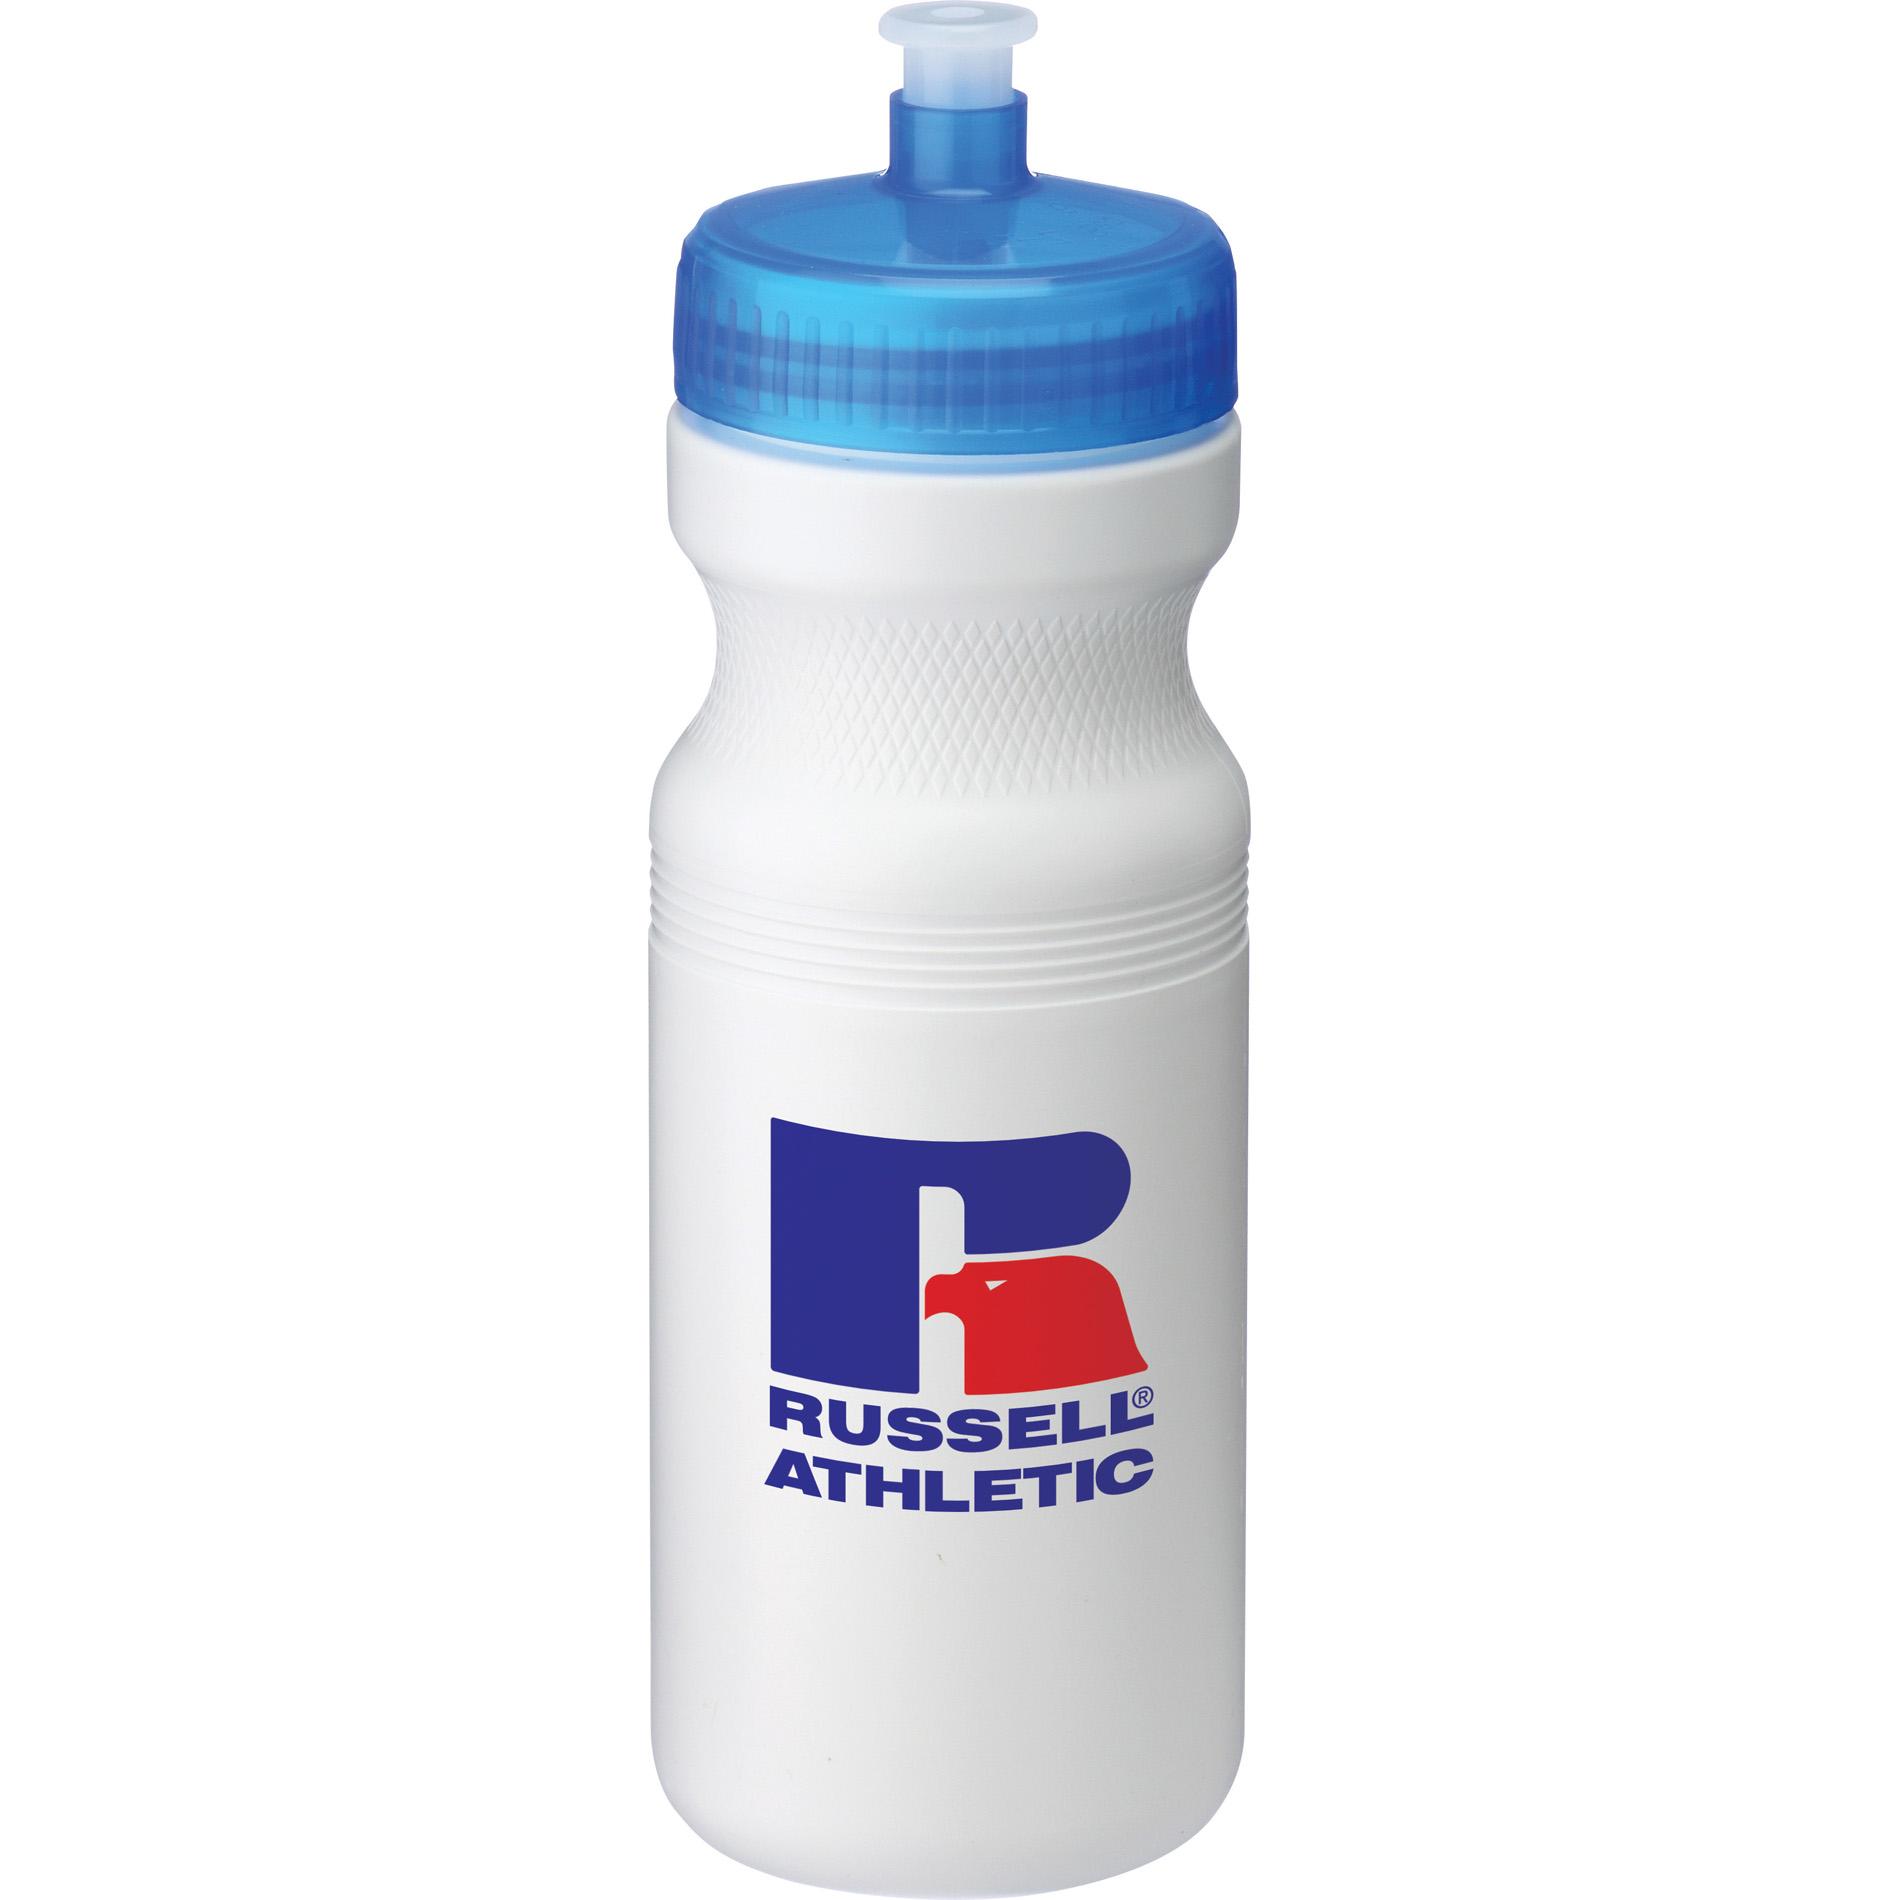 Easy Squezy Sports Bottle